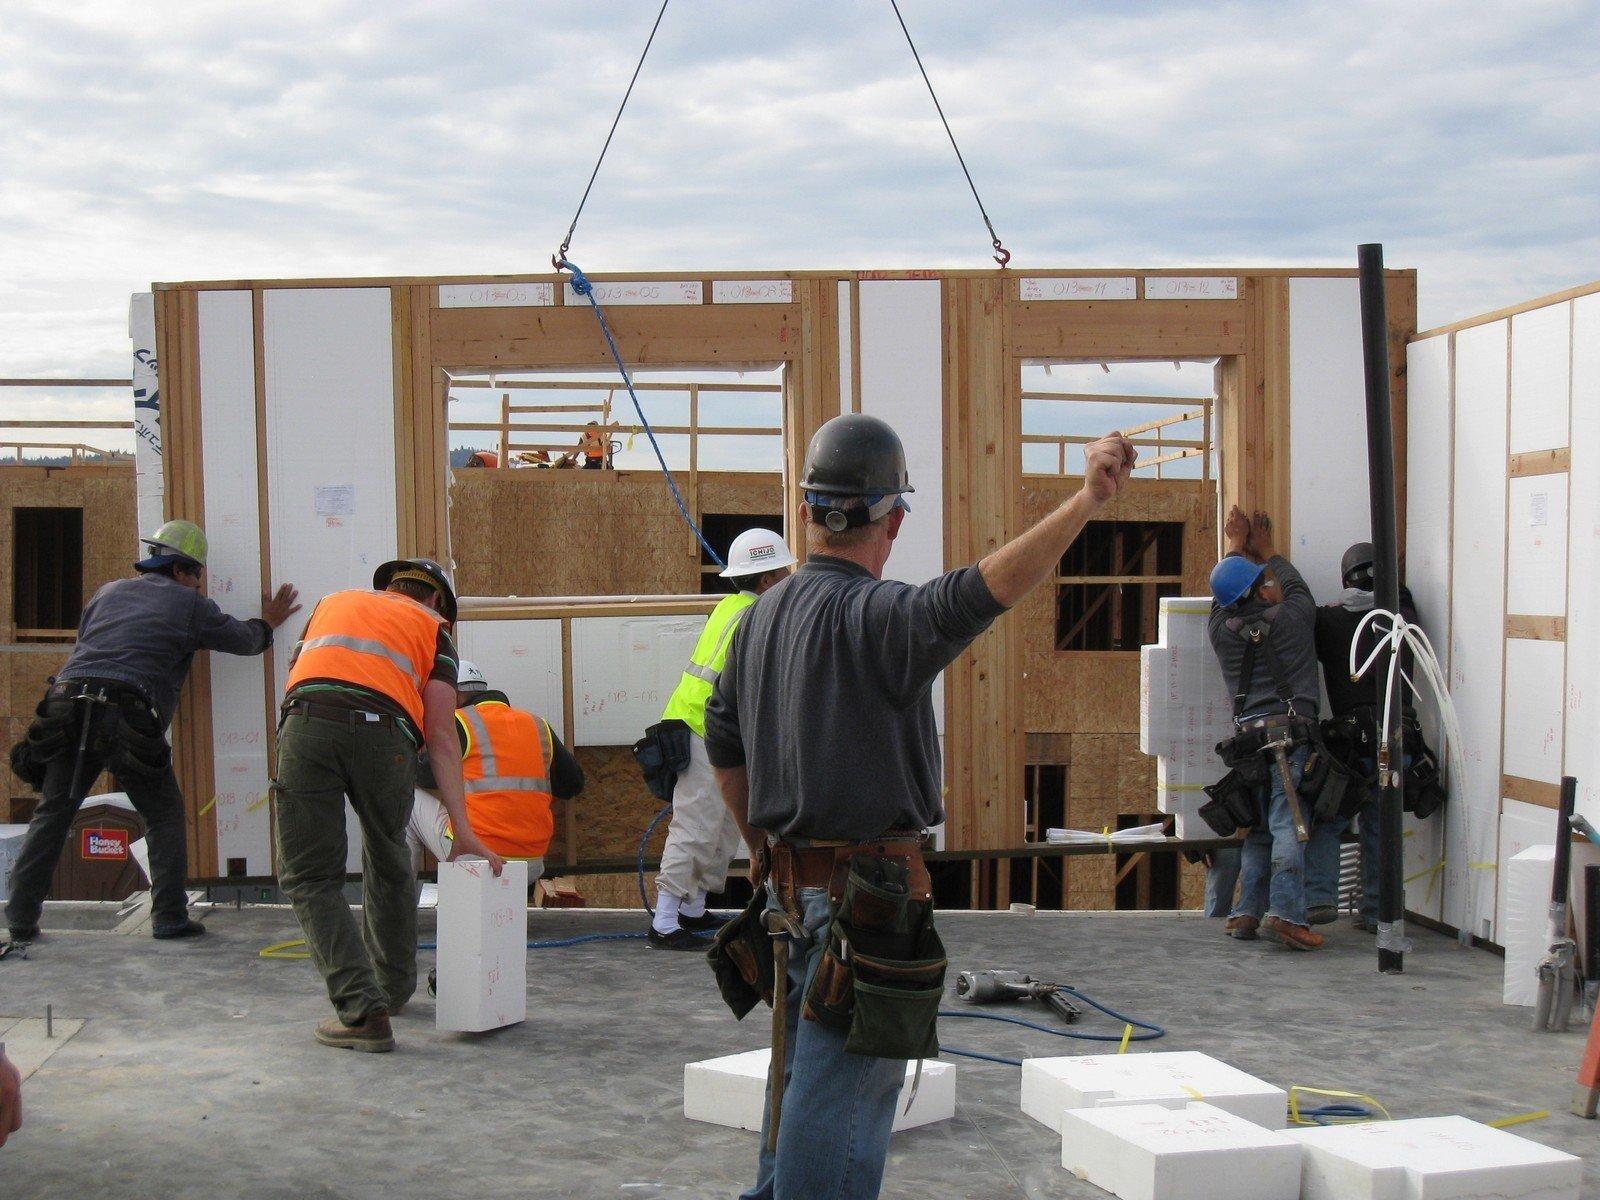 Photo 1 of 4 in A Zero-Energy Community: Part 10